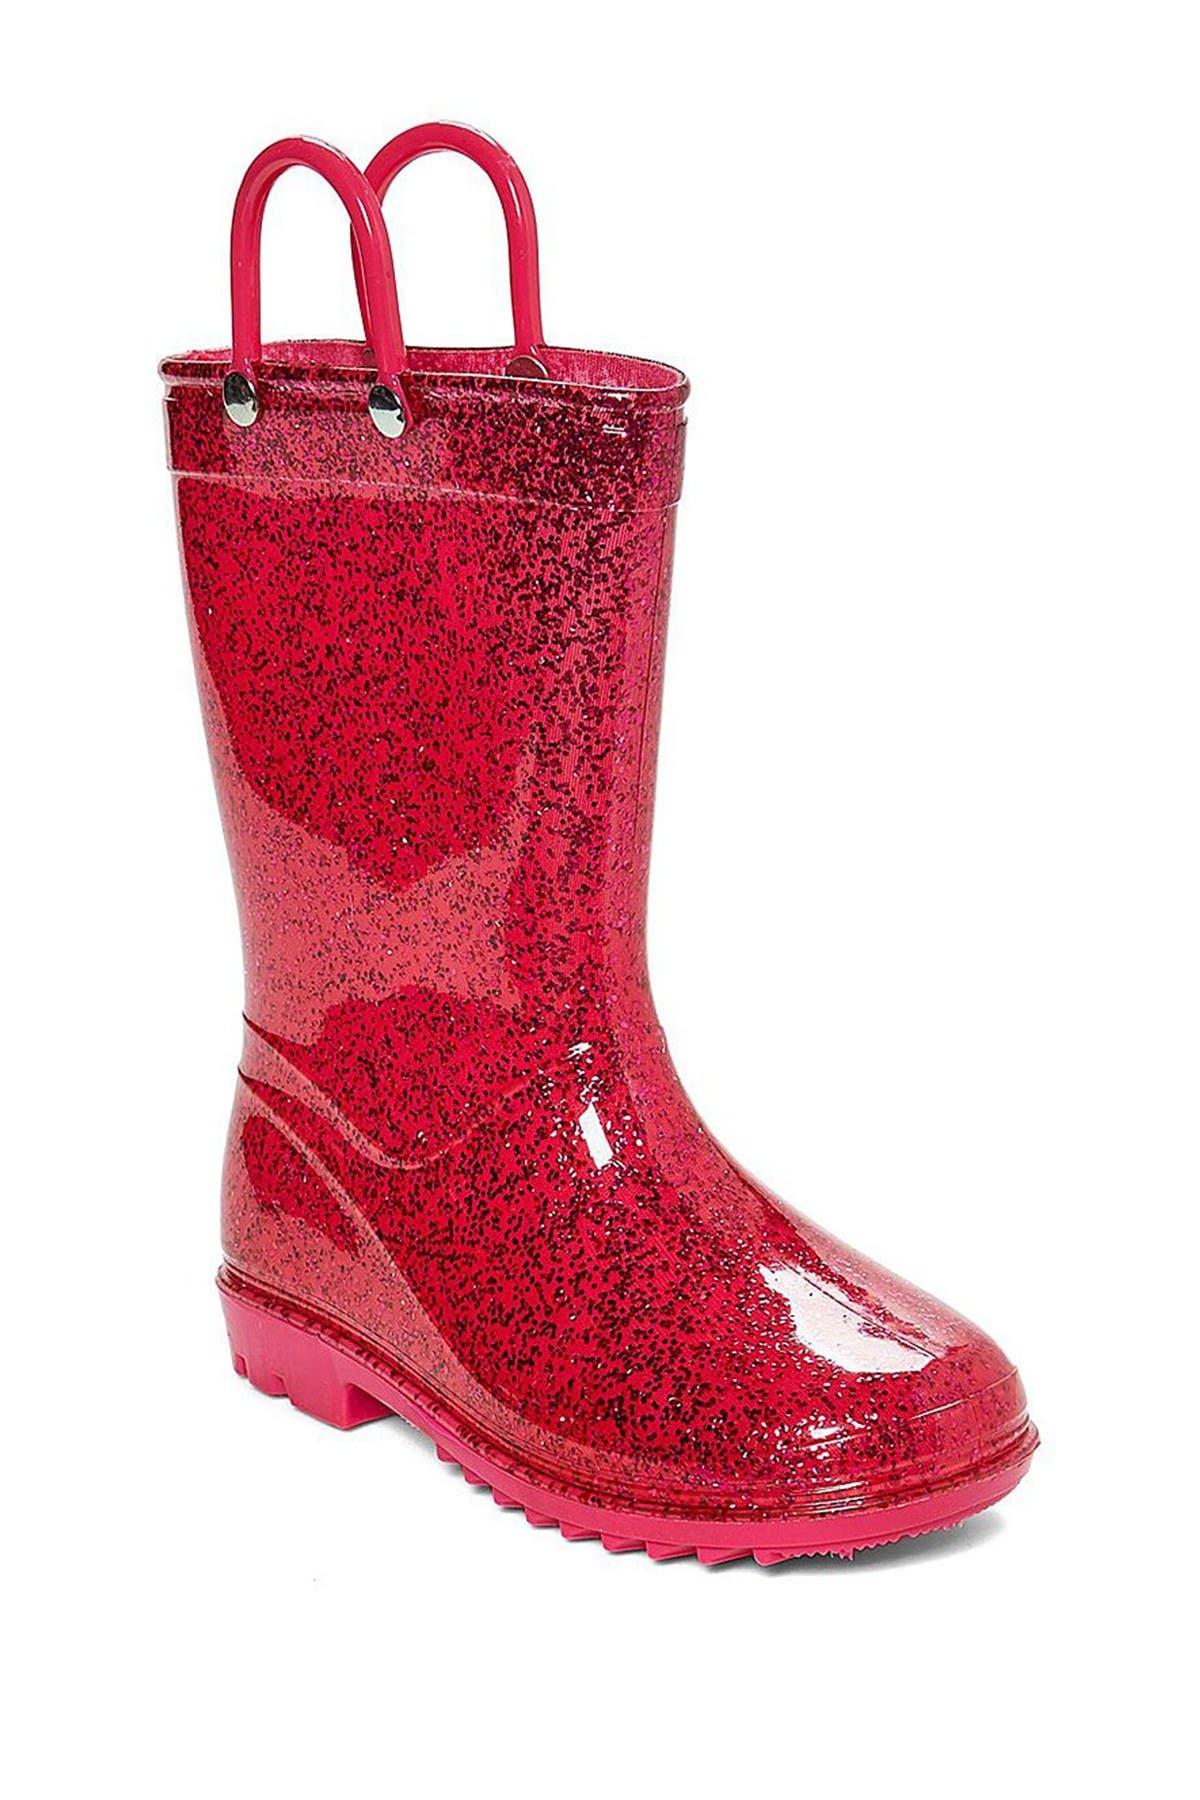 LILLY OF NEW YORK Glitter PVC Rain Boot